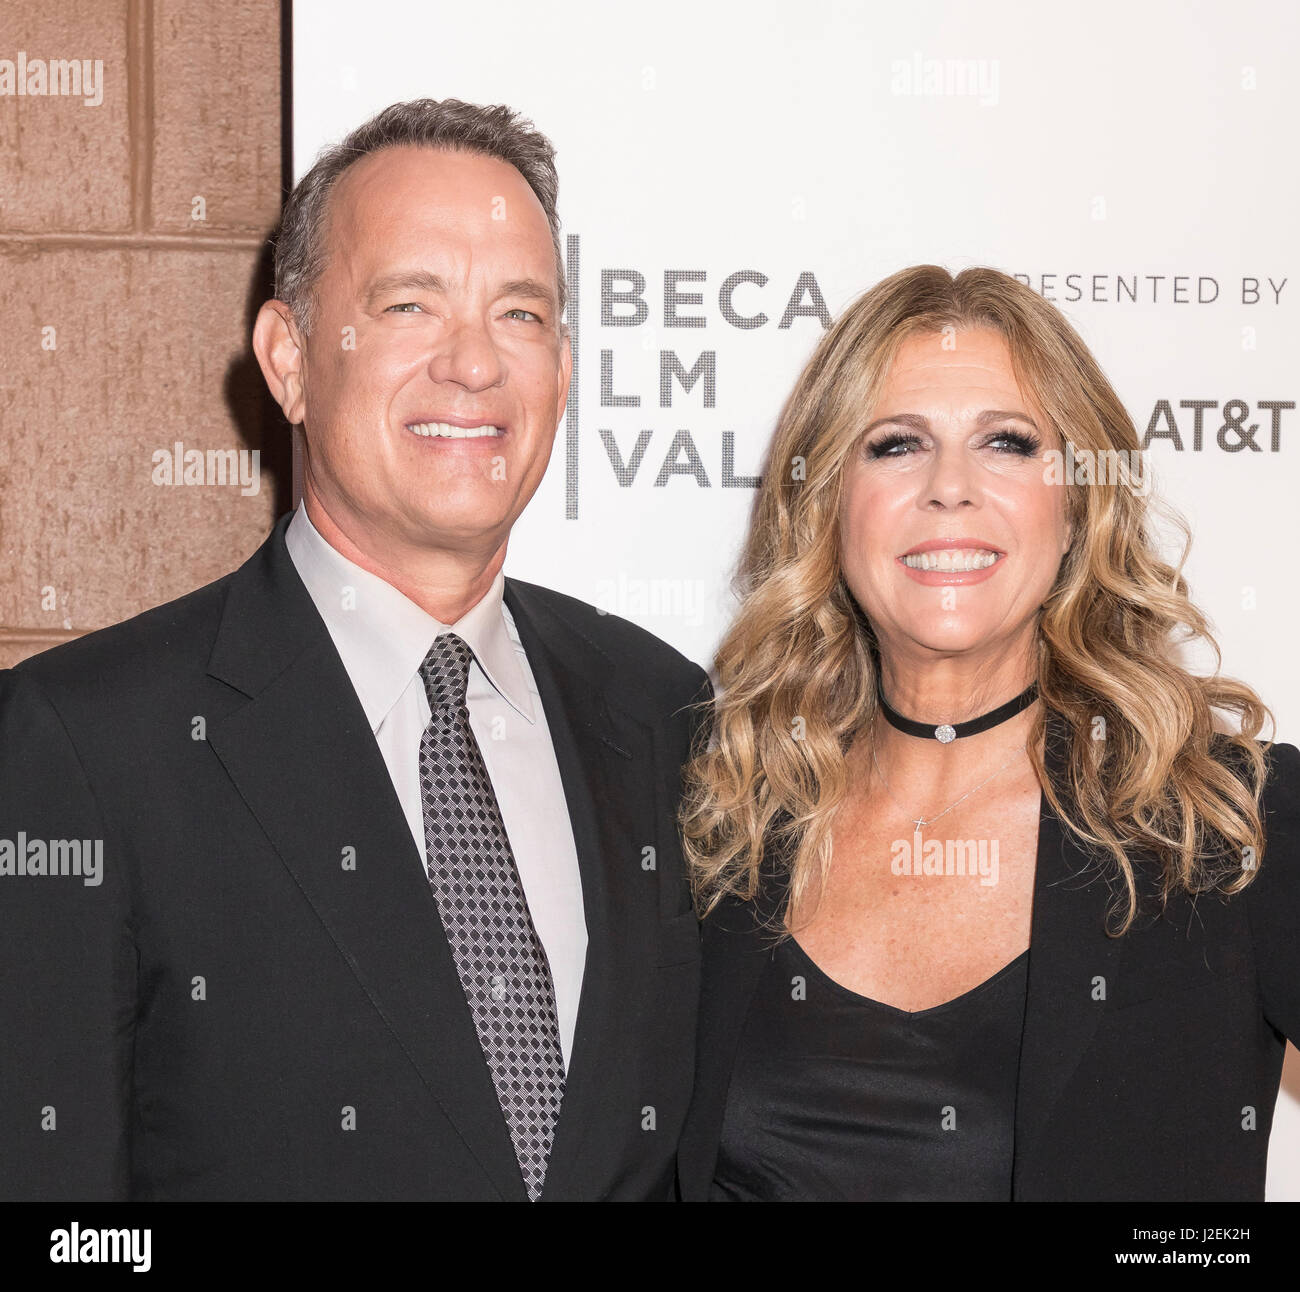 Tom Hanks And Rita Wilson Stock Photos & Tom Hanks And ...